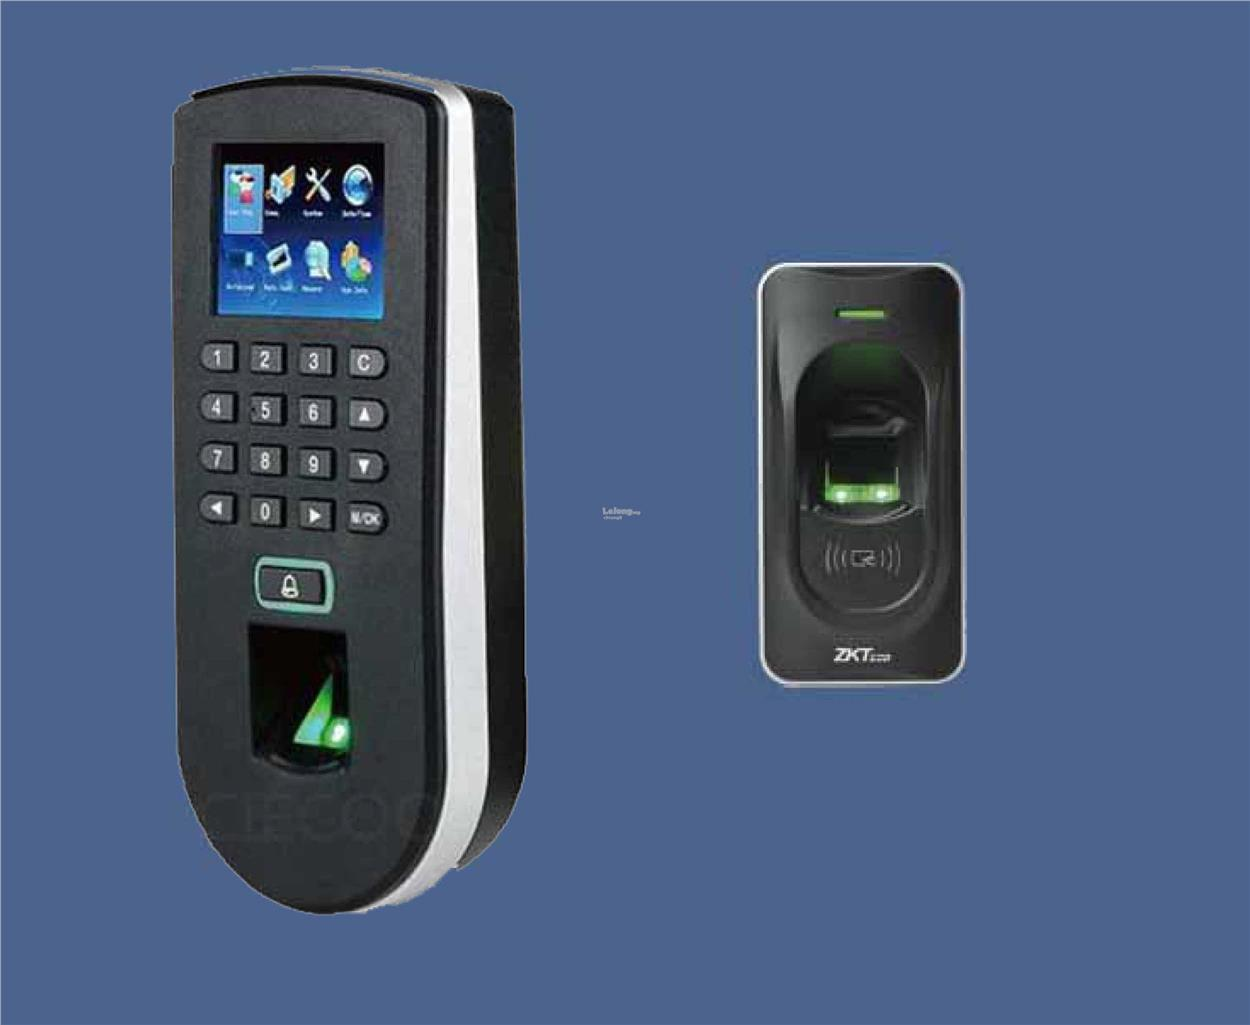 Fingerprint RFID Door Access with Attendance TF1900 + FR1200 S & Fingerprint RFID Door Access with A (end 11/2/2018 10:15 AM)